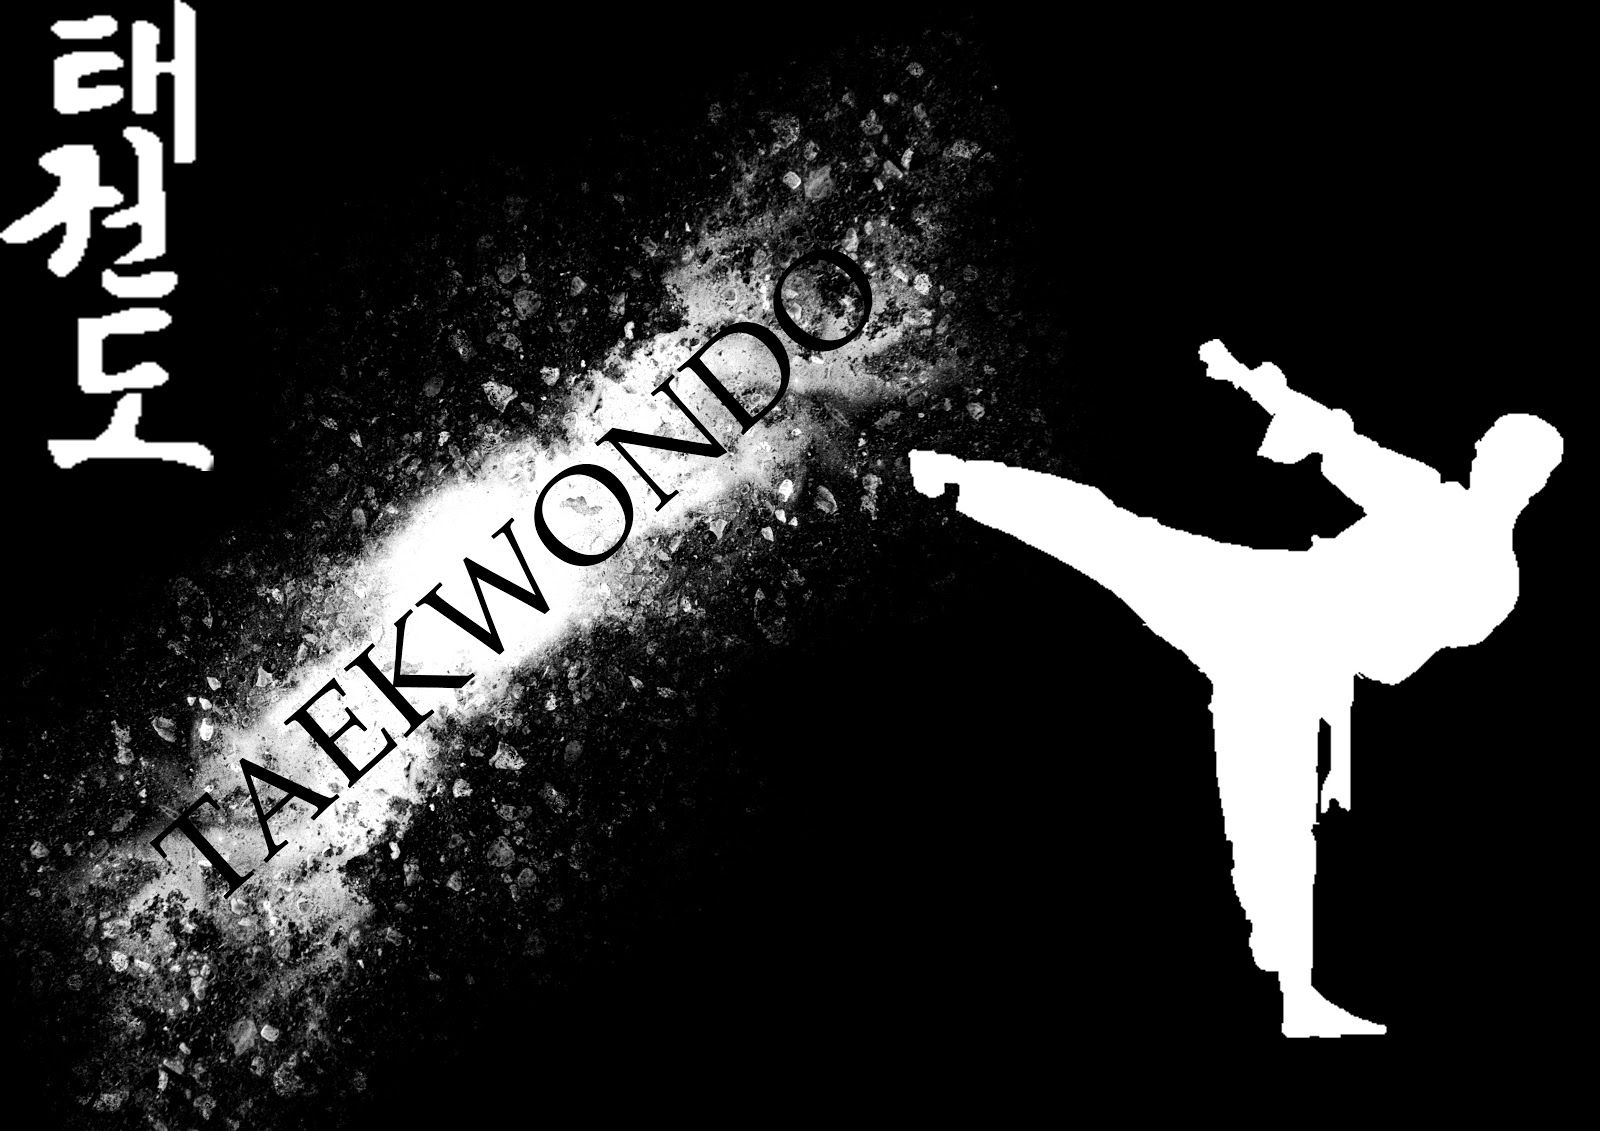 Taekwondo Wallpaper Download Taekwondo What is taekwondo Tkd 1600x1131